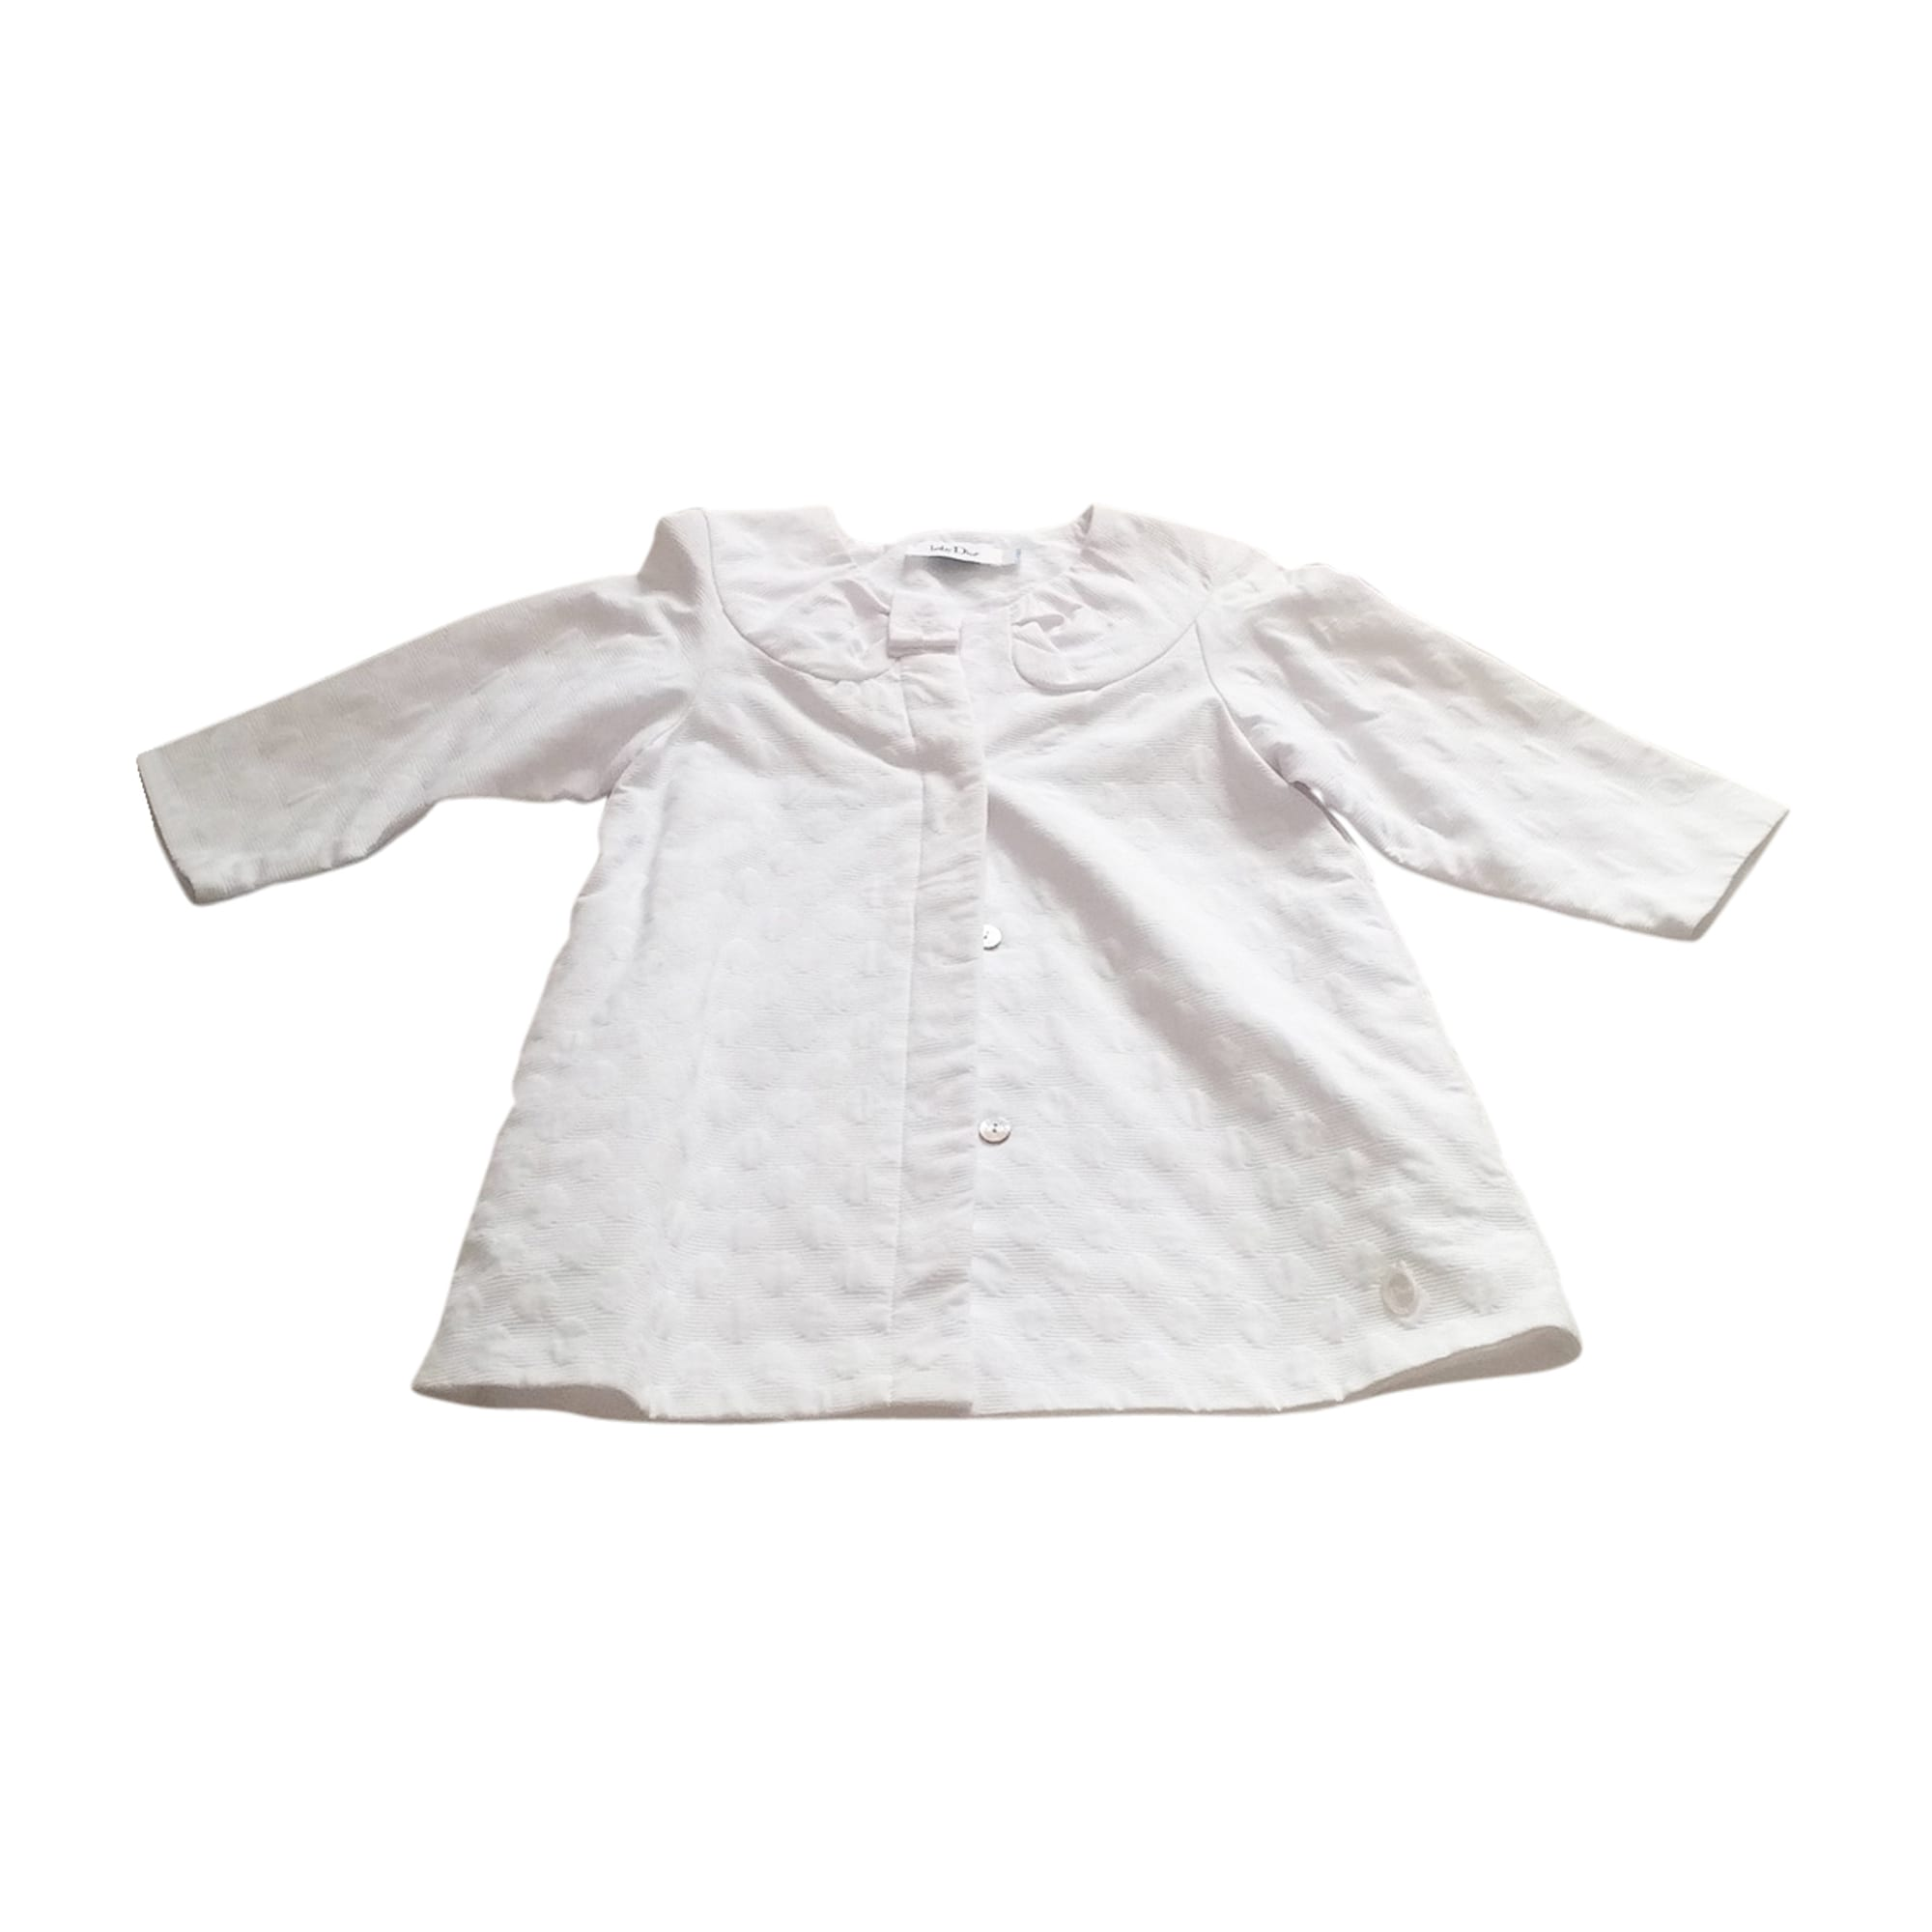 Coat BABY DIOR White, off-white, ecru